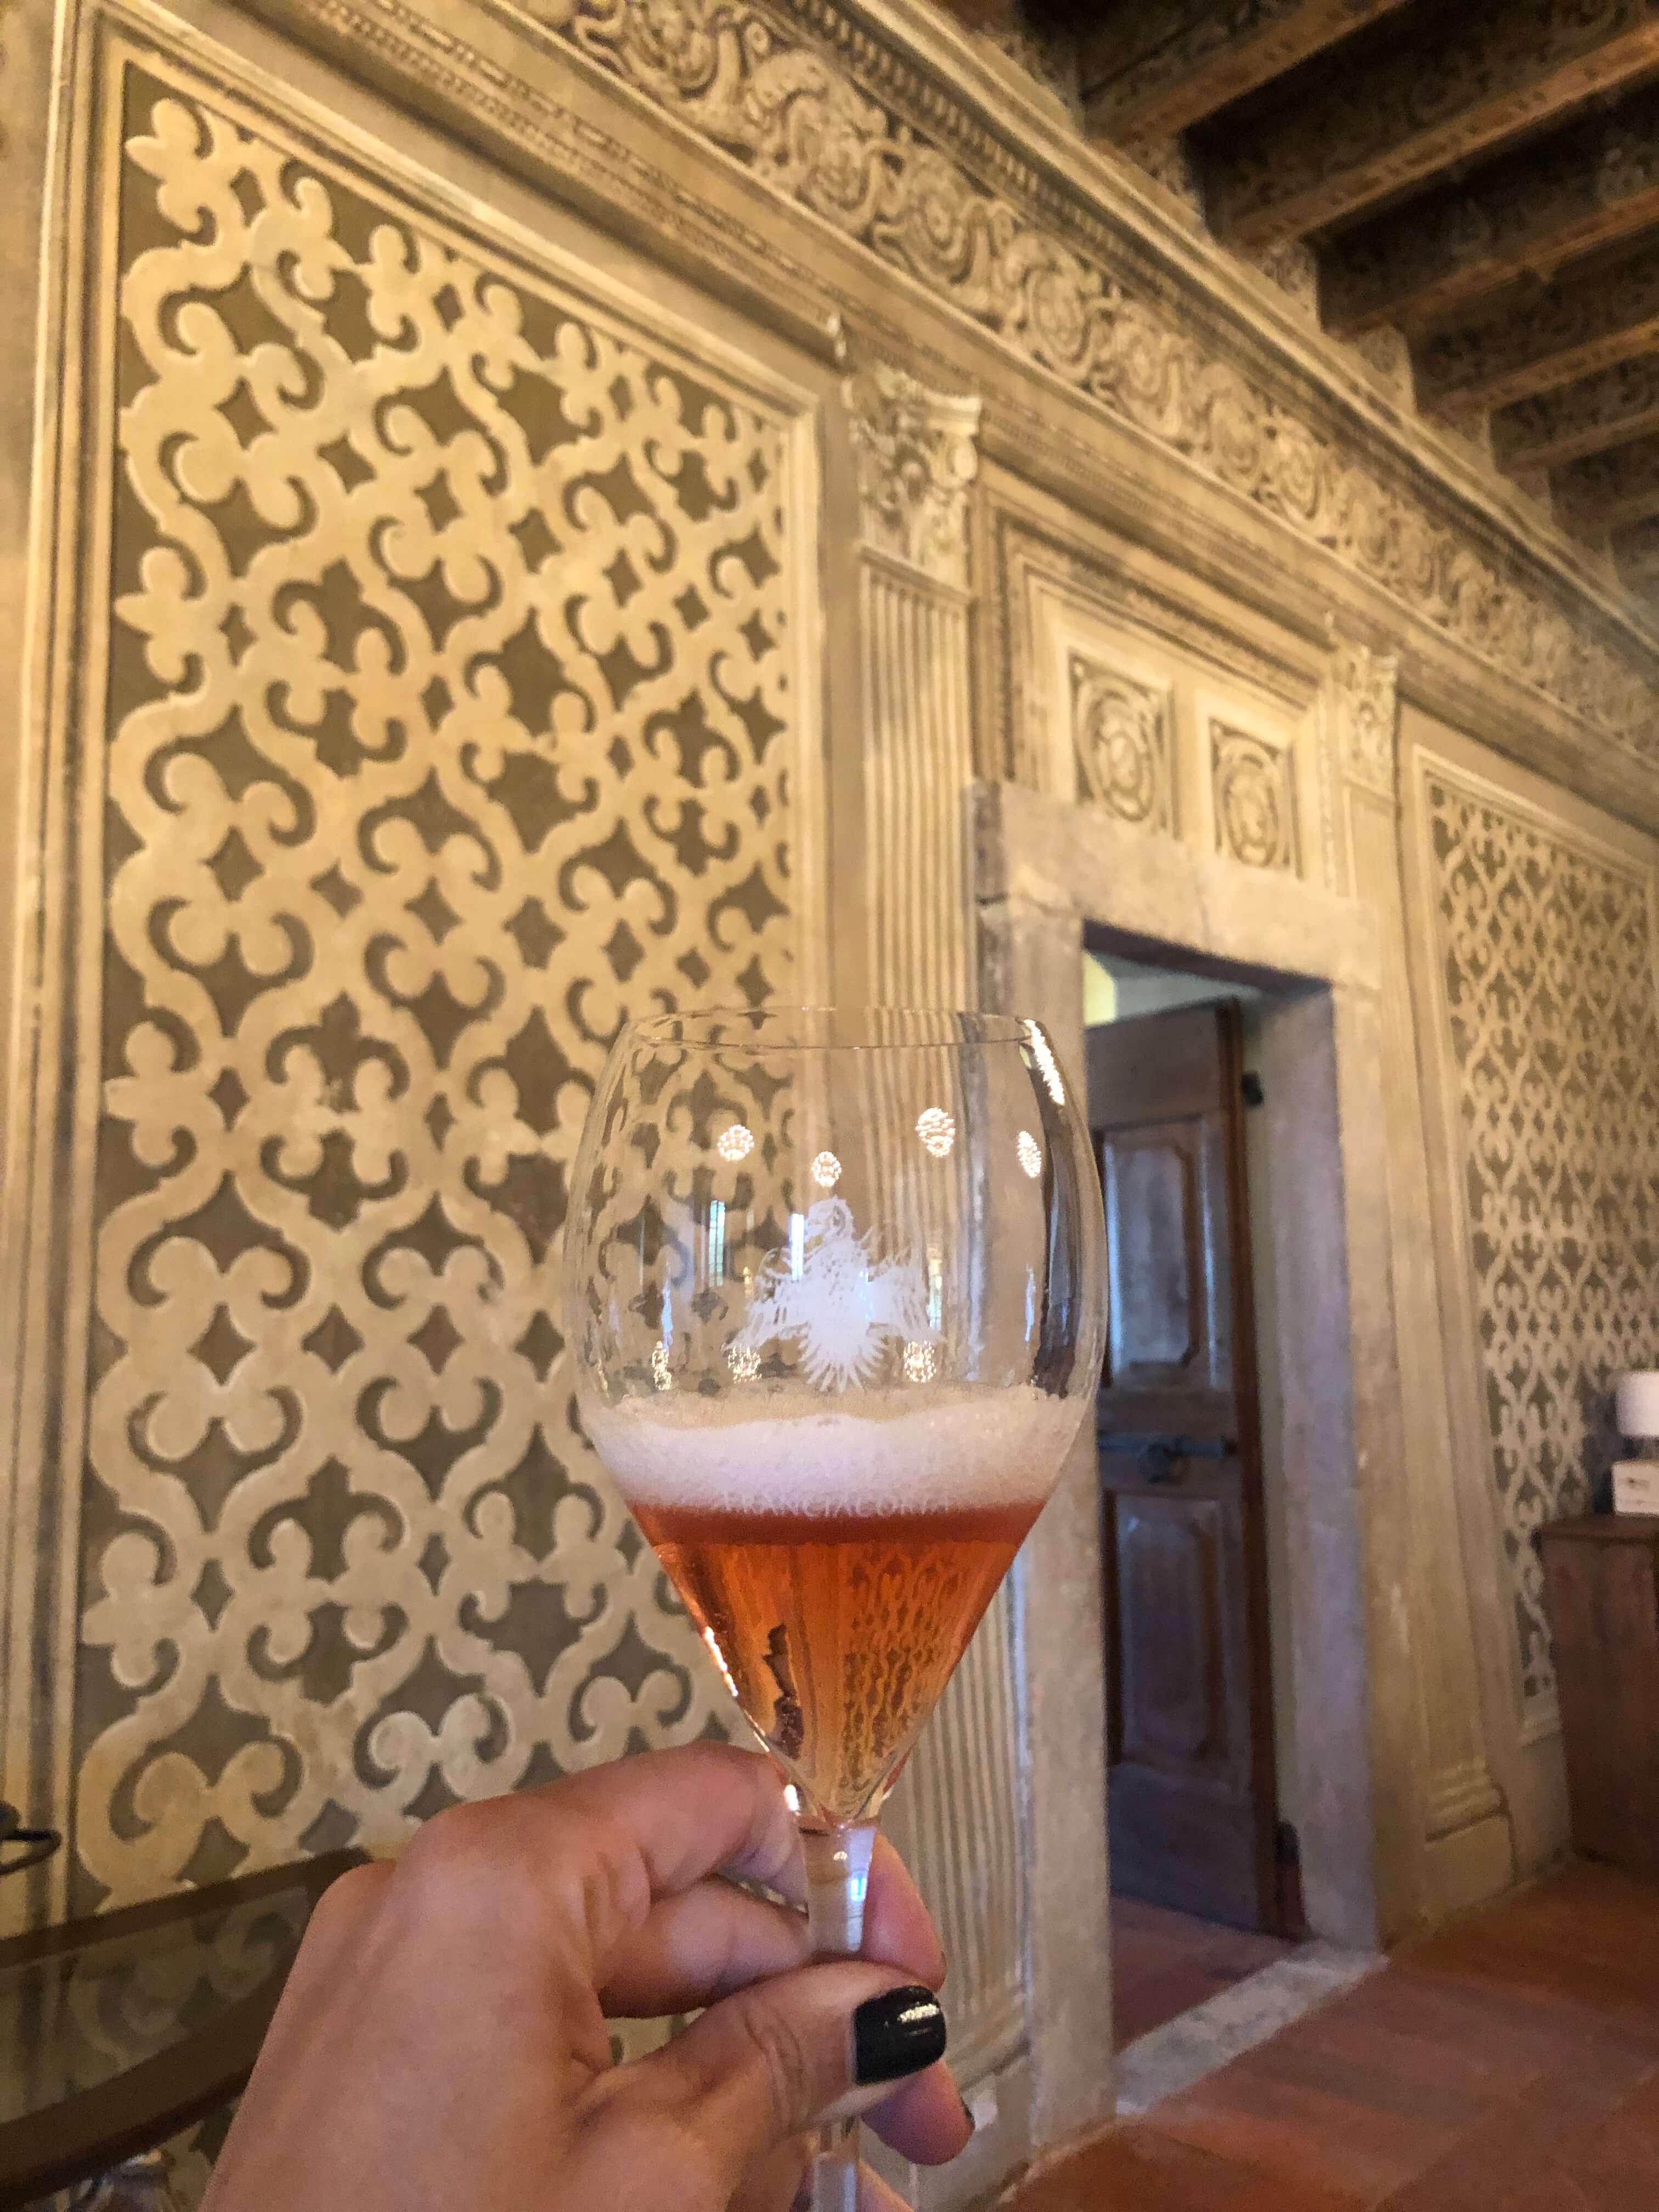 lo spaviere Franciacorta wine region